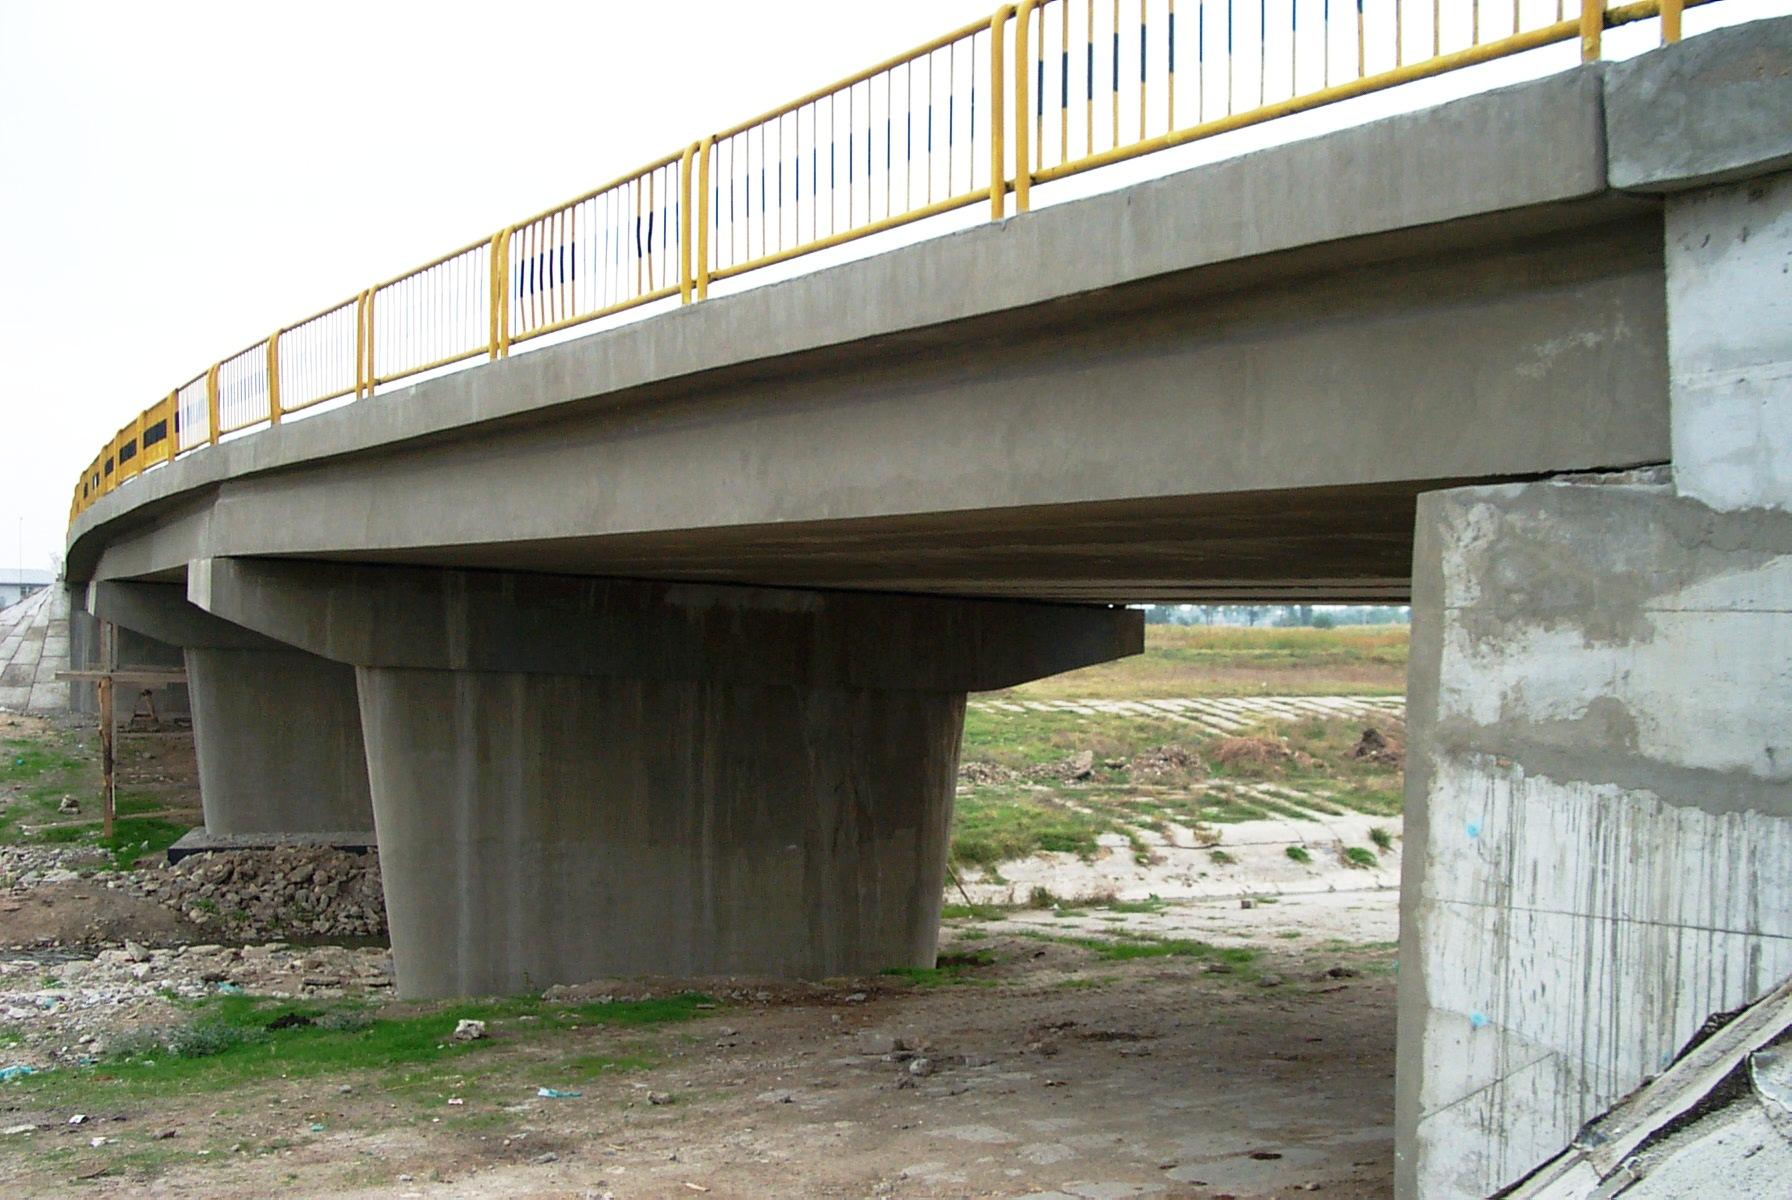 Reparatii pod (DN2), Km. 33 - 028, peste raul Calnistea MAPEI - Poza 11